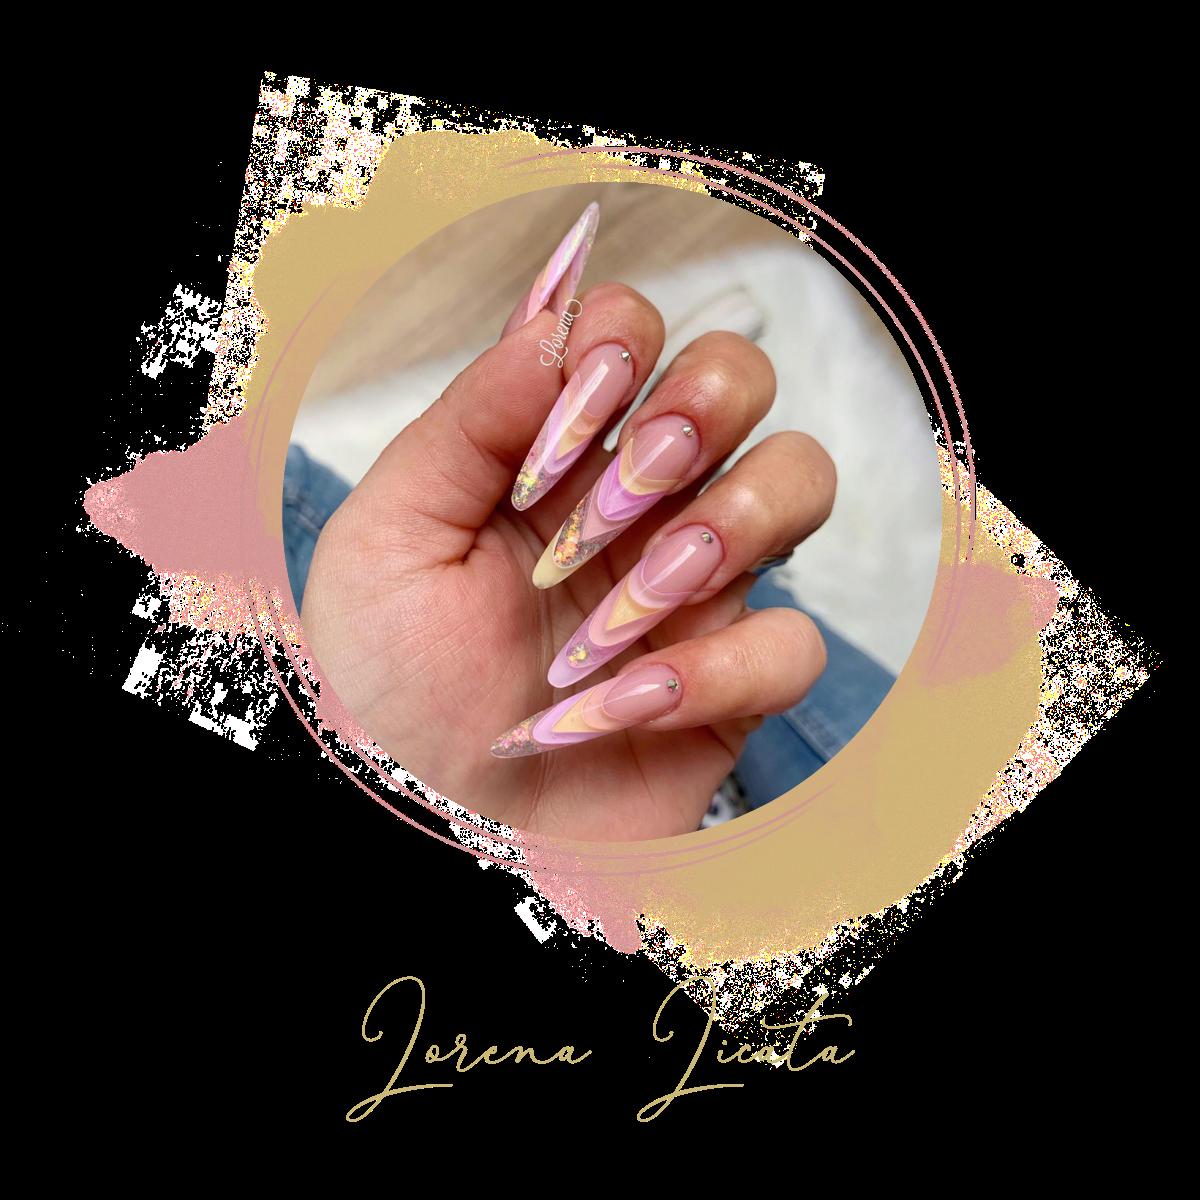 Lorena Licata – Technique Quilling Nails